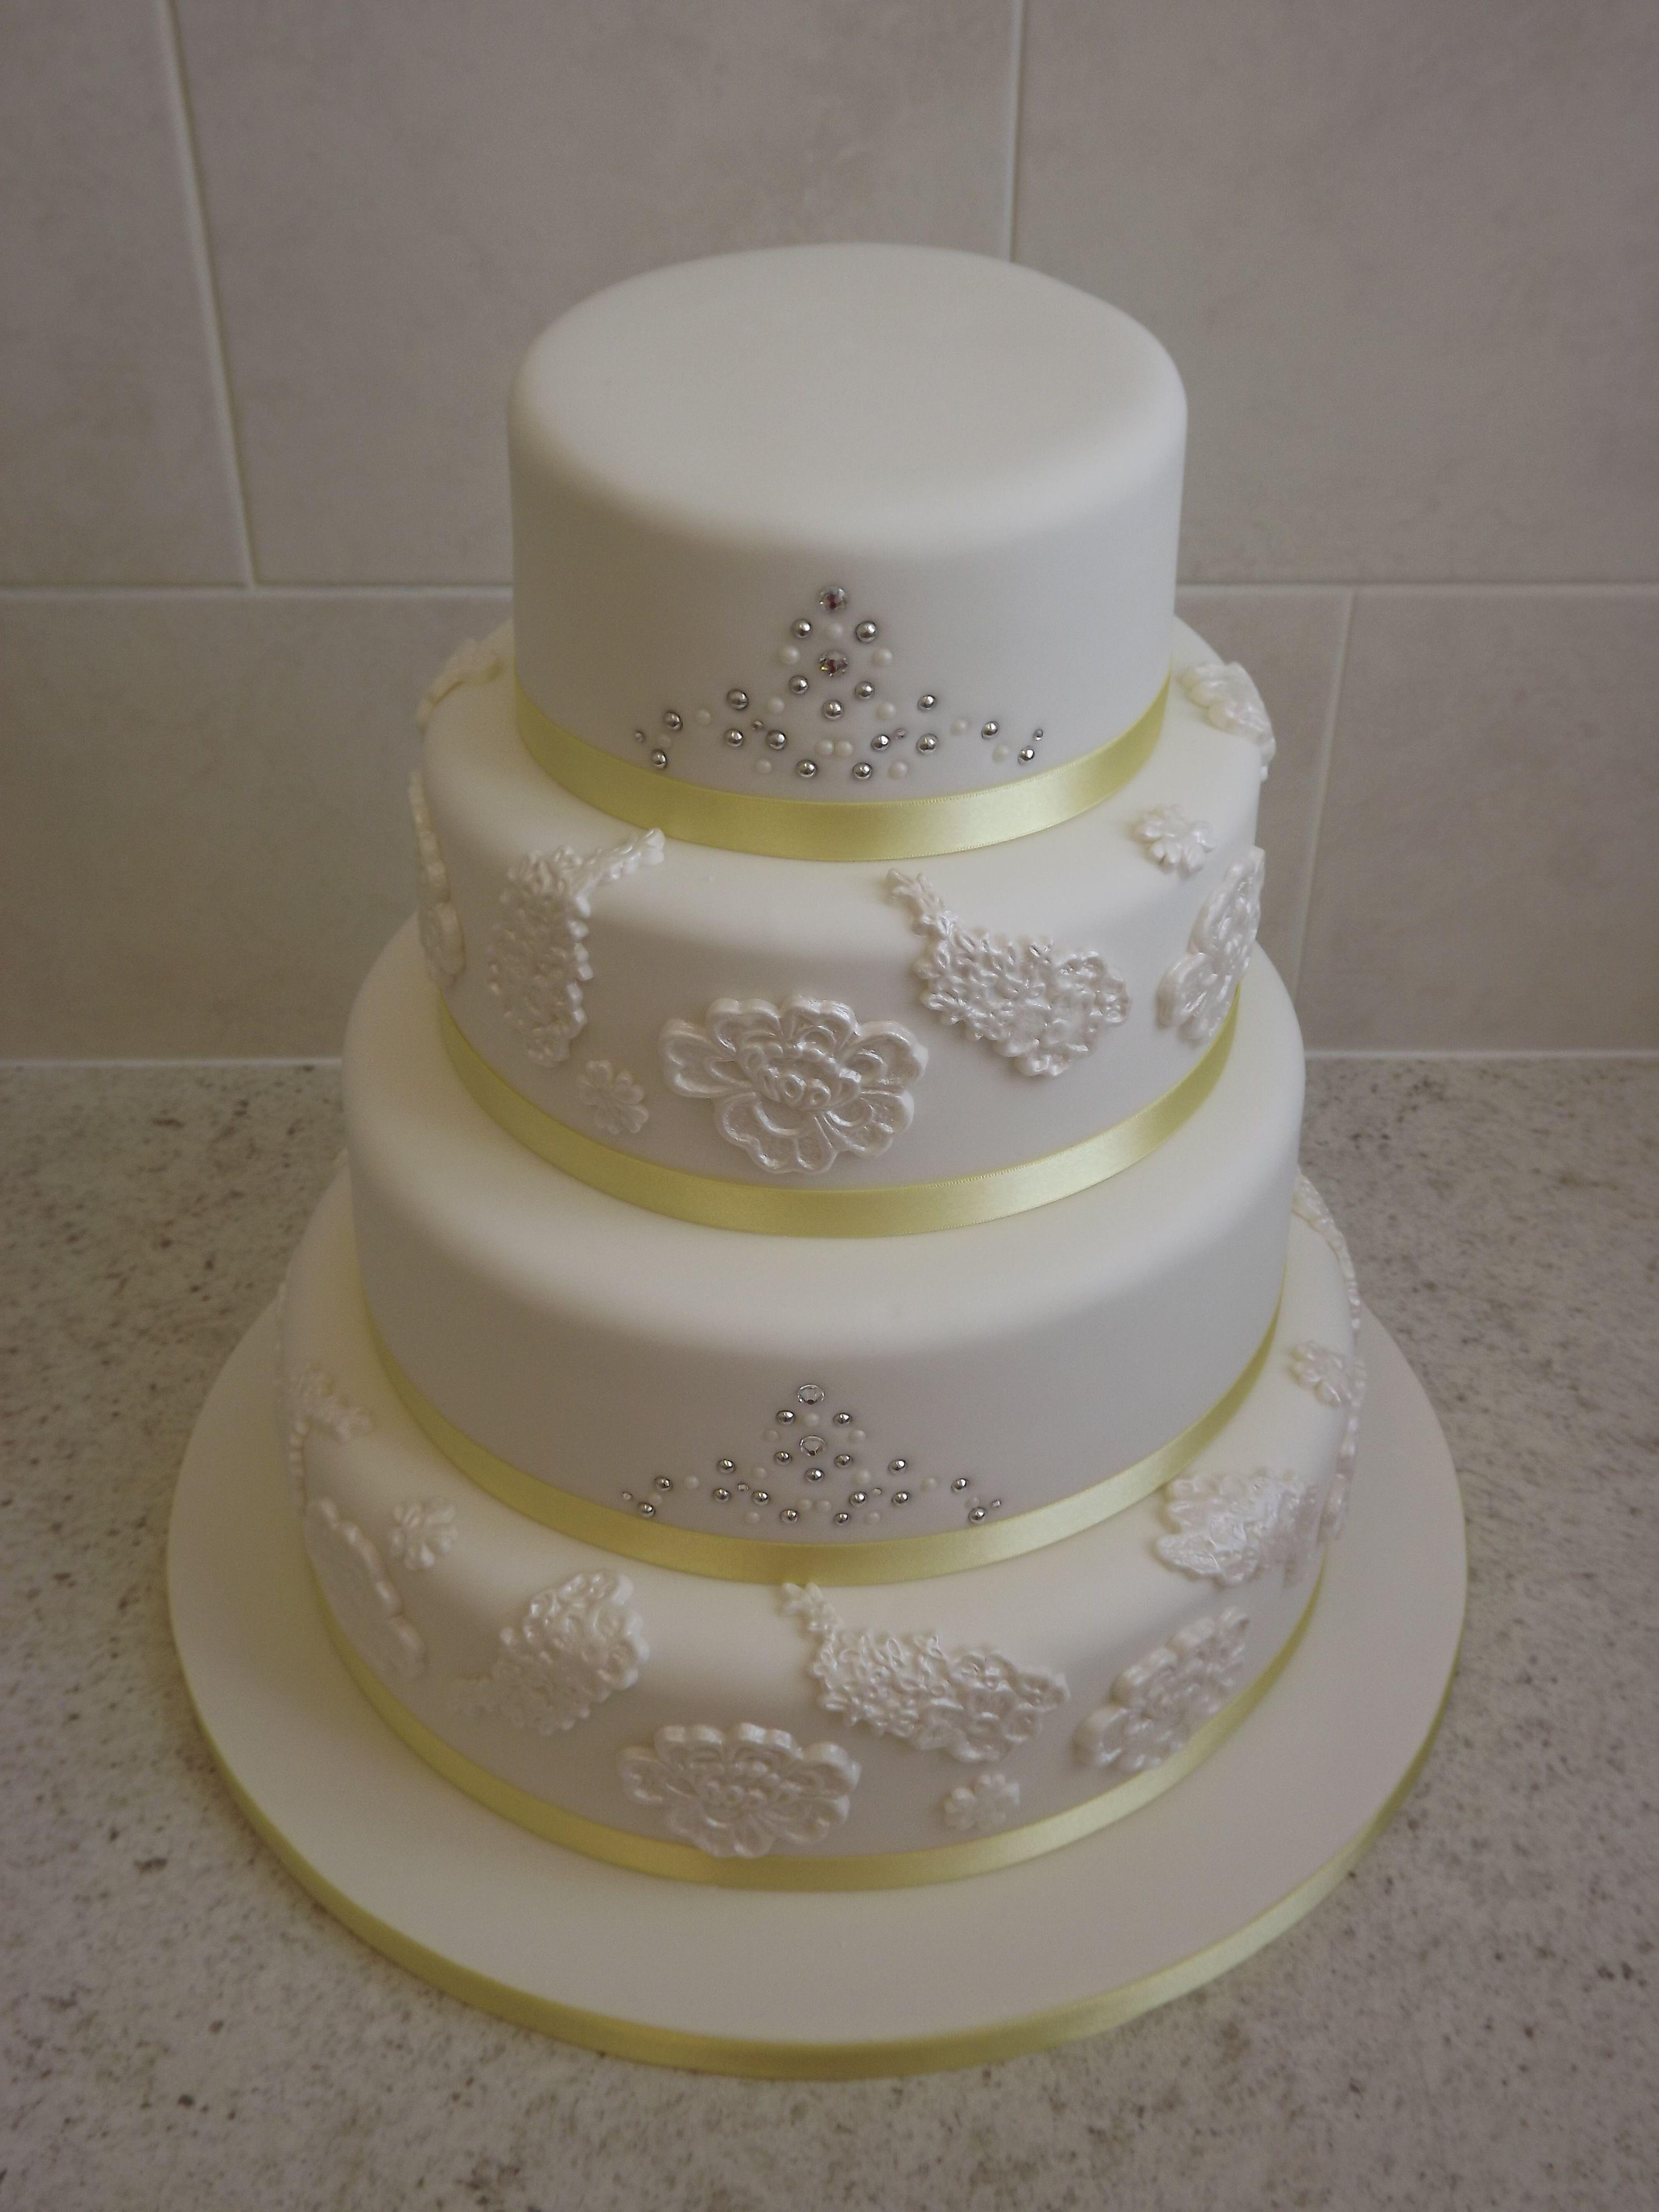 4 Tier Wedding Cake Ice Queen Cakes Designer Wedding - Wedding Cakes Wigan